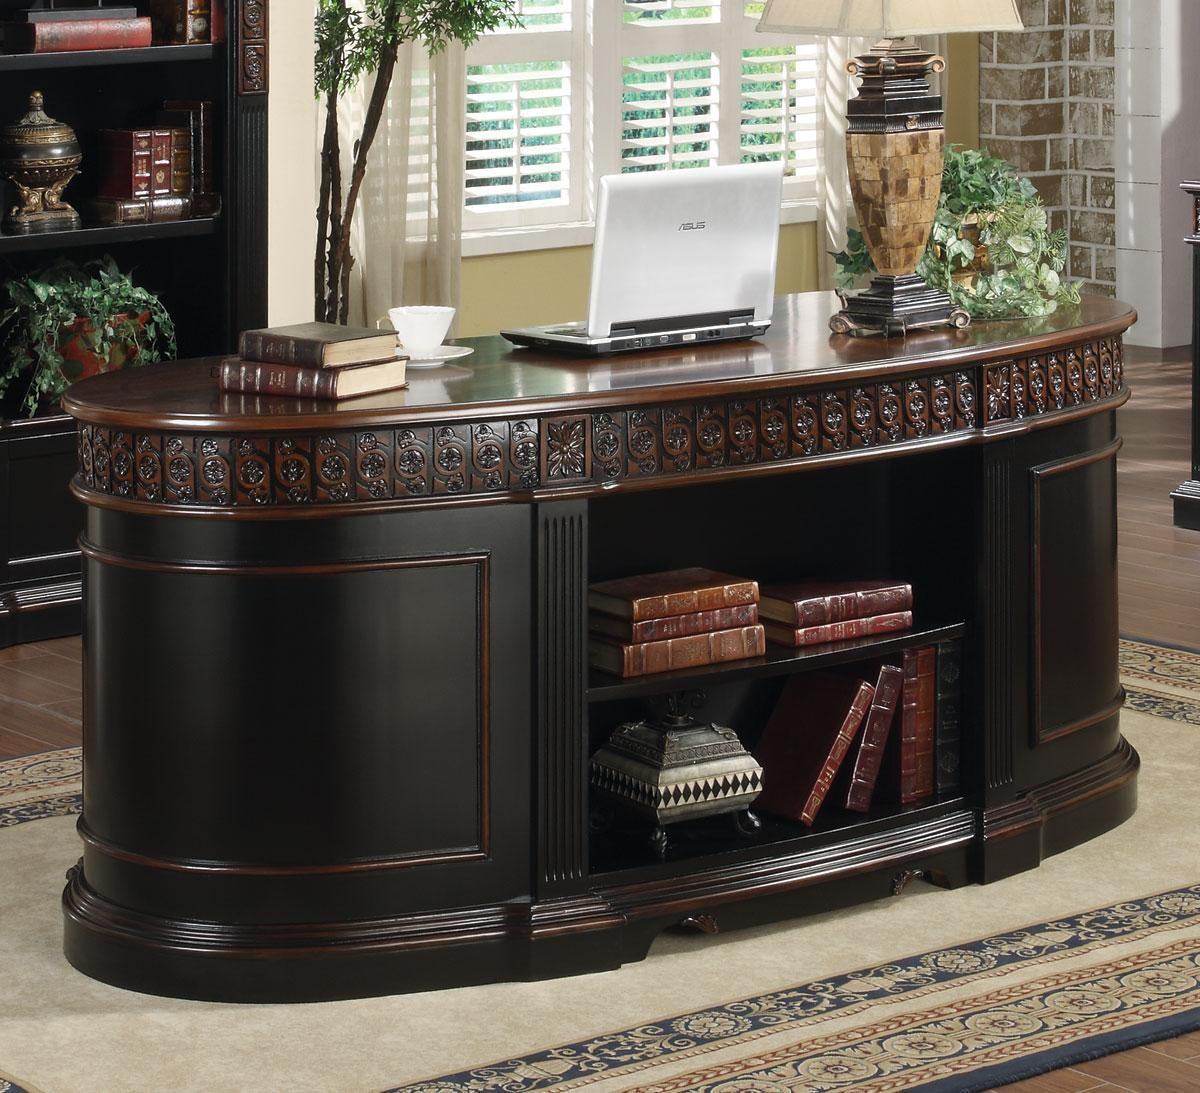 Nicolas Executive Home Office Desk 800921 From Coaster